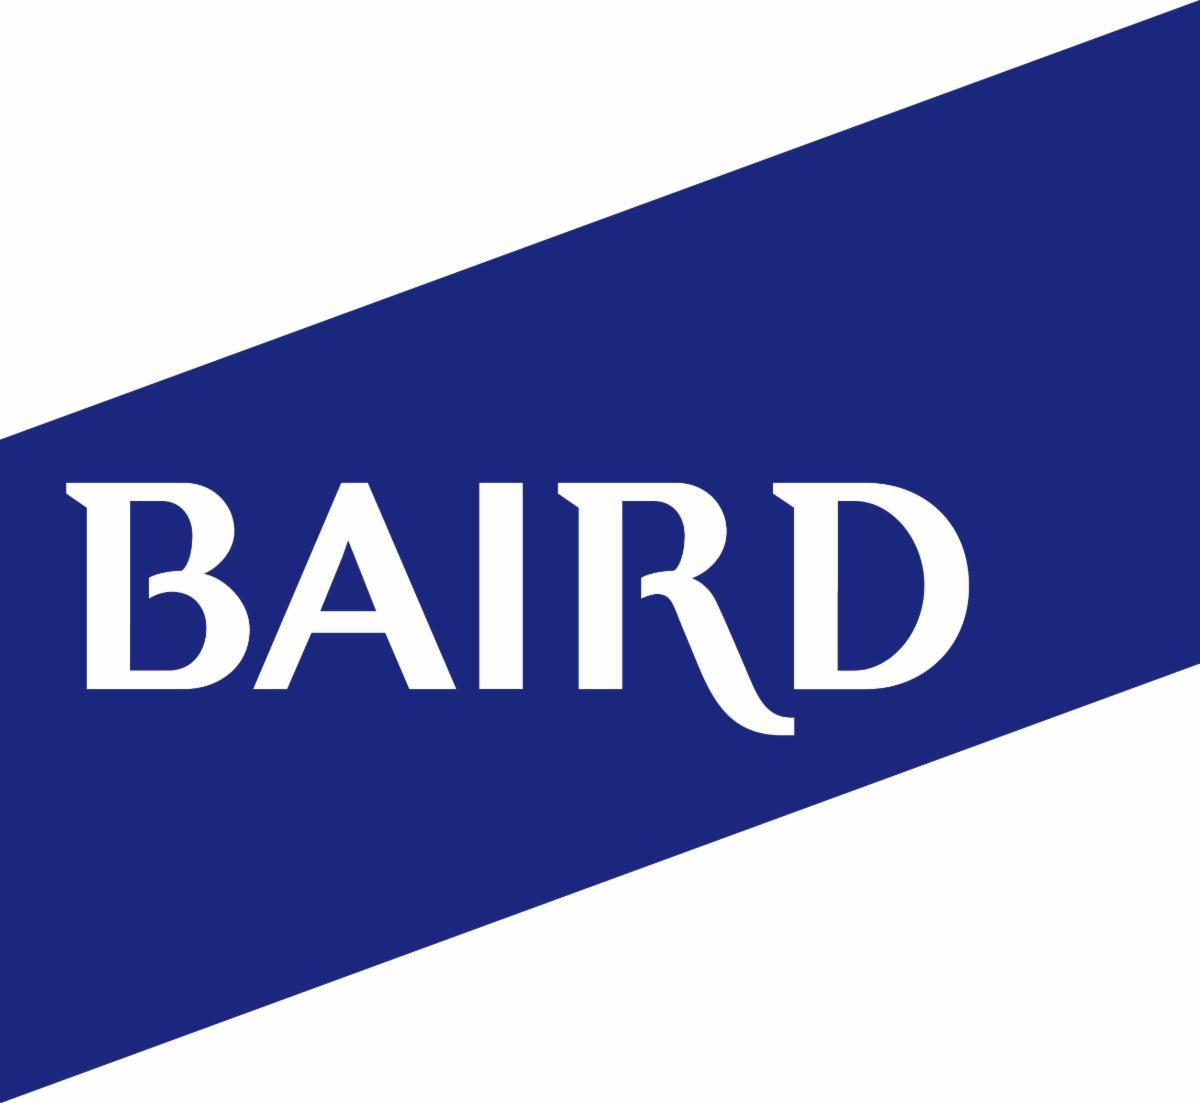 Baird logo color.jpg